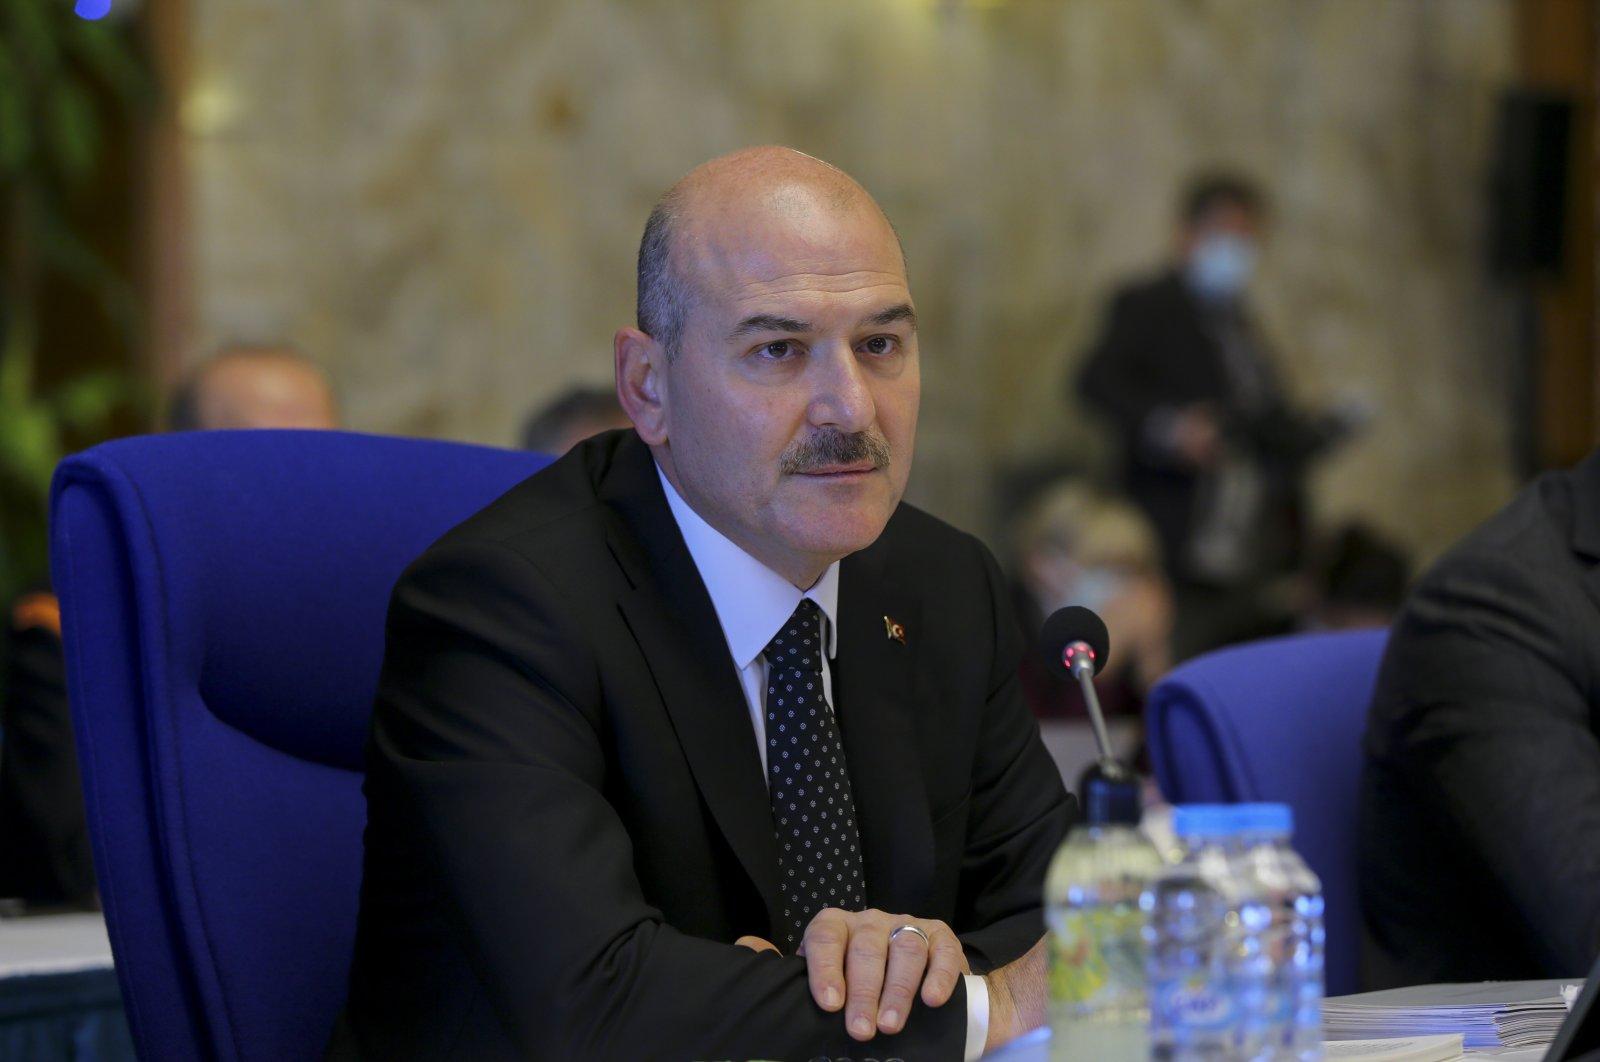 Interior Minister Süleyman Soylu attends a meeting for the 2021 budget at the Turkish Parliament, Ankara, Turkey, Nov. 26, 2020. (AA Photo)